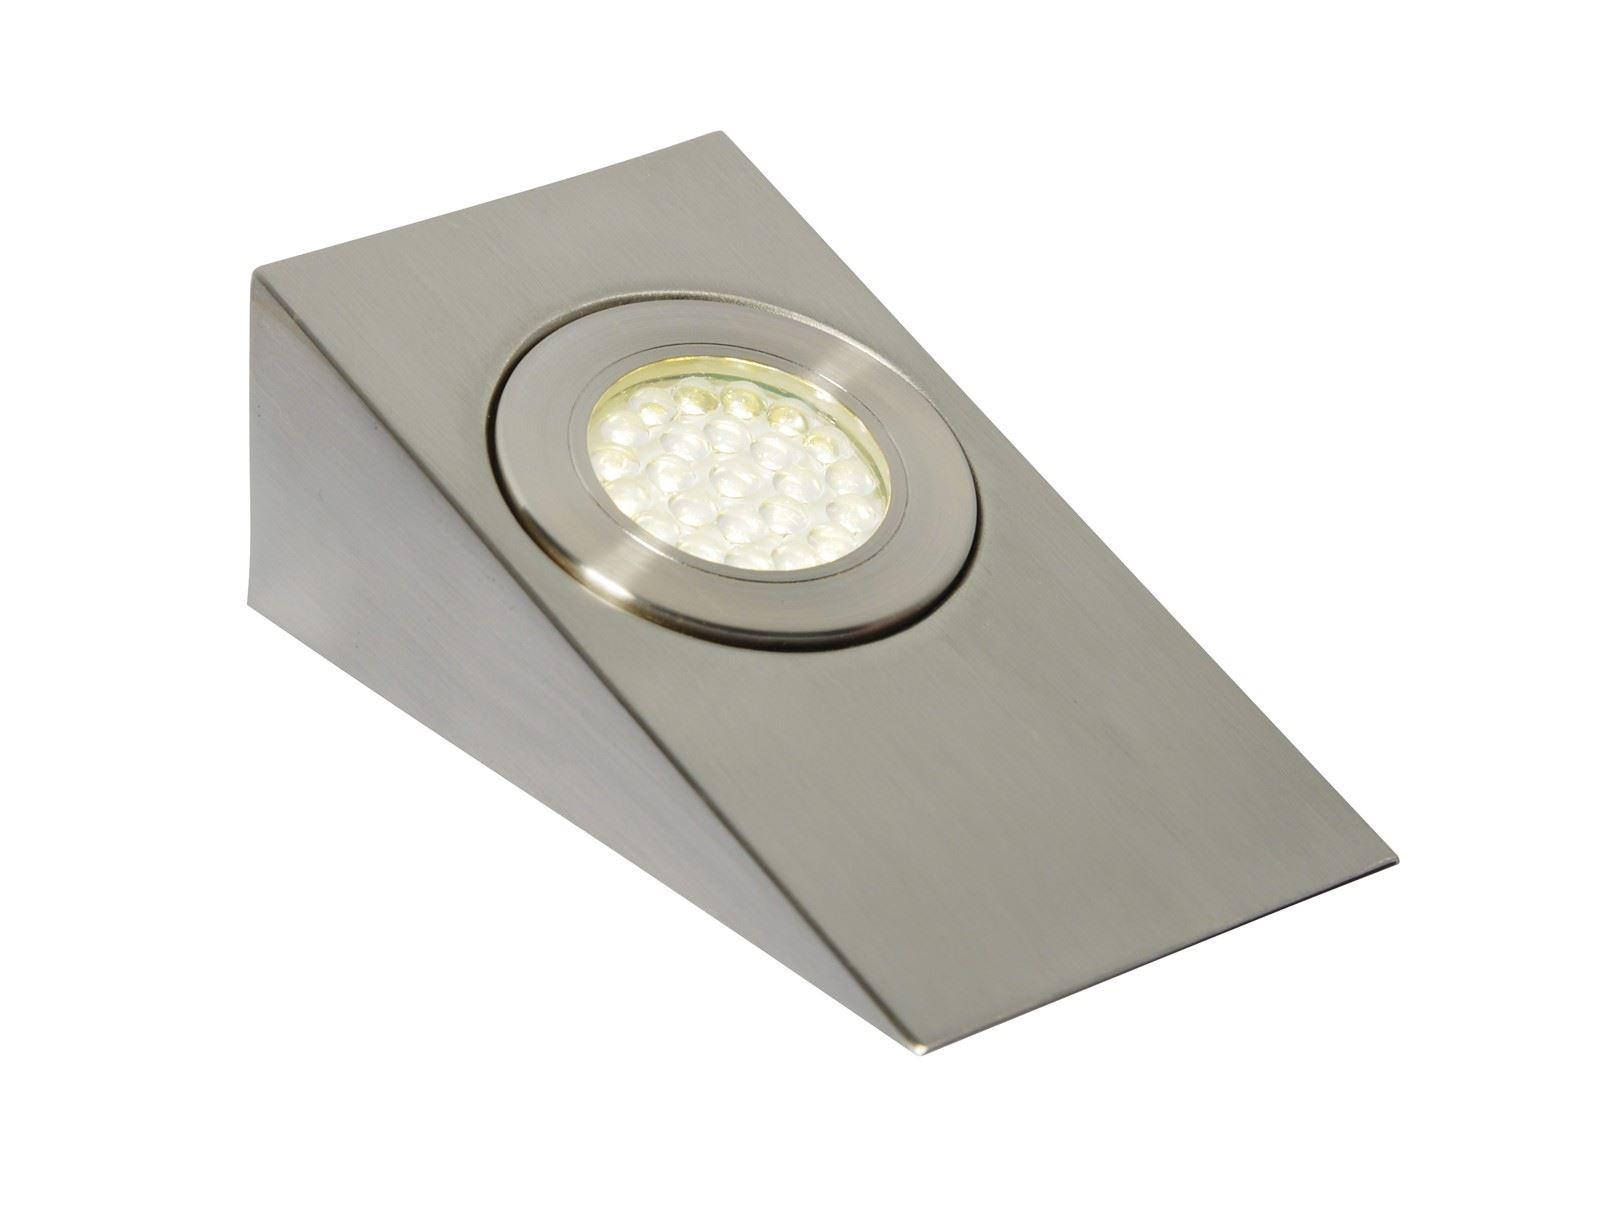 Lago Led, Mains Voltage, Wedge Cabinet Light, 3000K Warm White